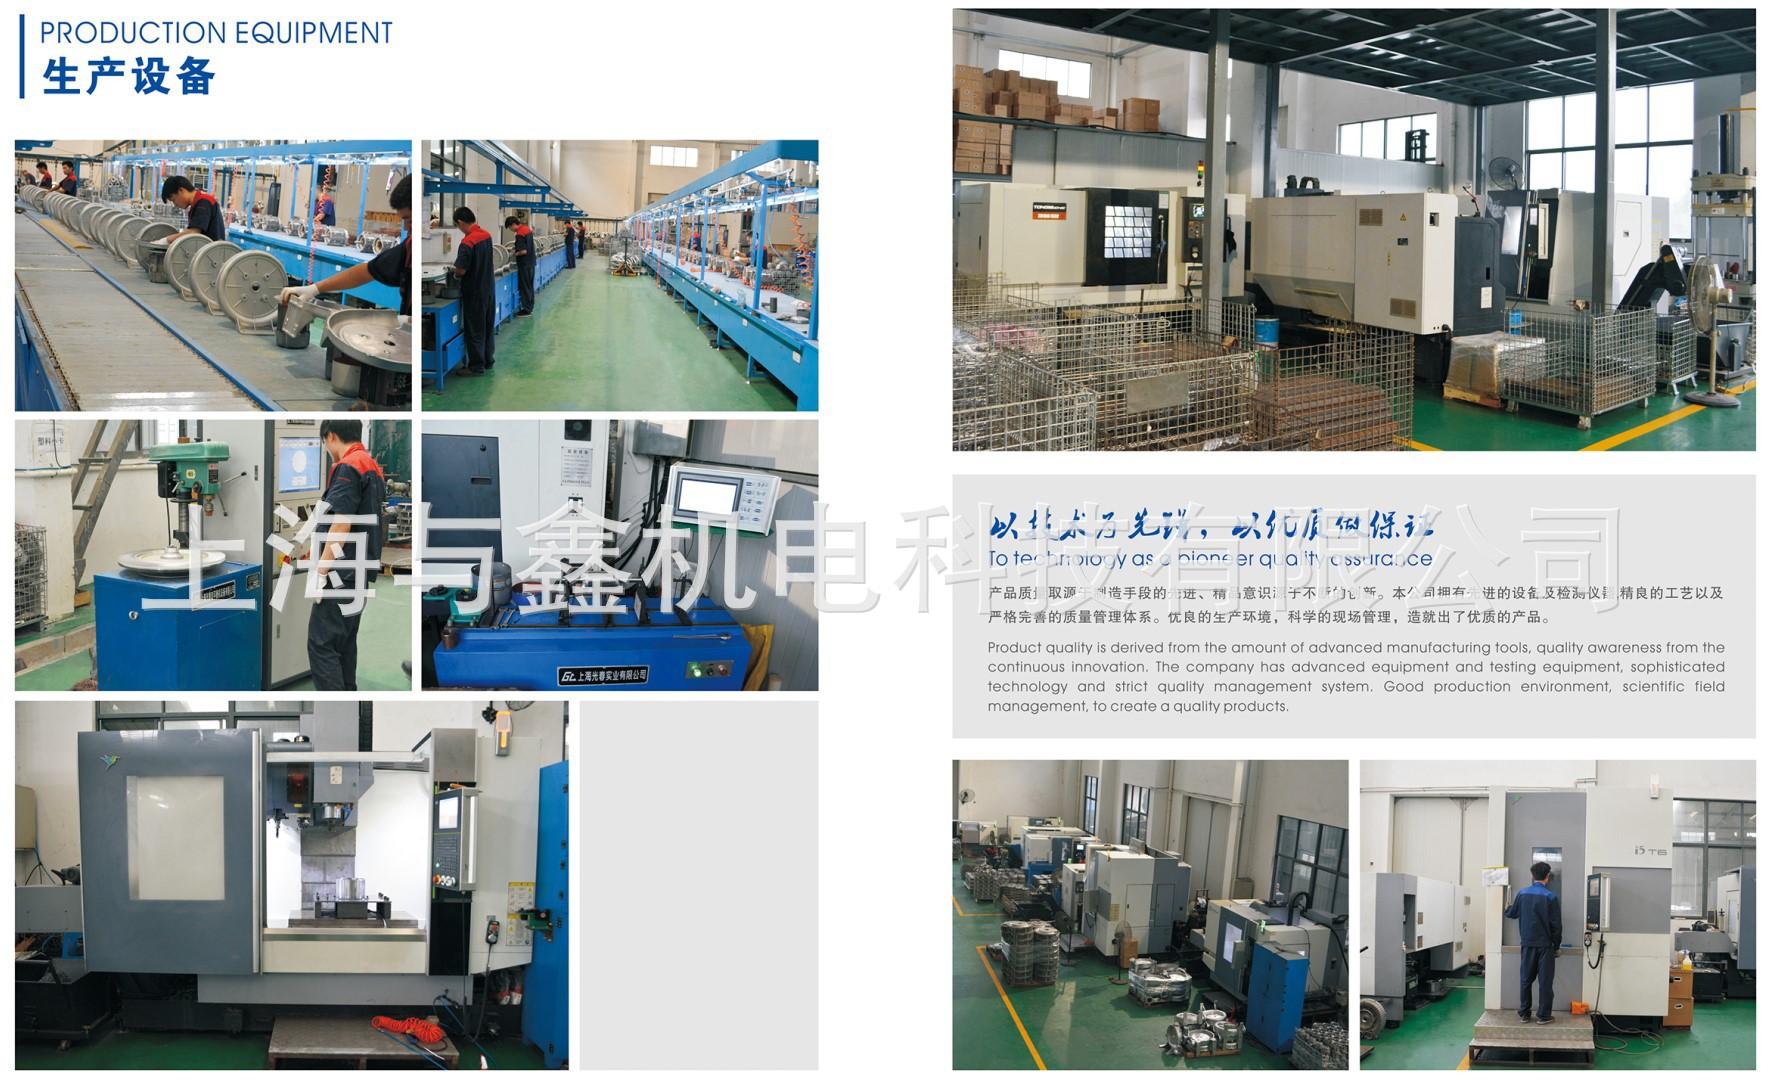 TWYX全风 DH1500工业移动吸尘器 1.5KW干湿两用吸尘器 工业吸尘器示例图15